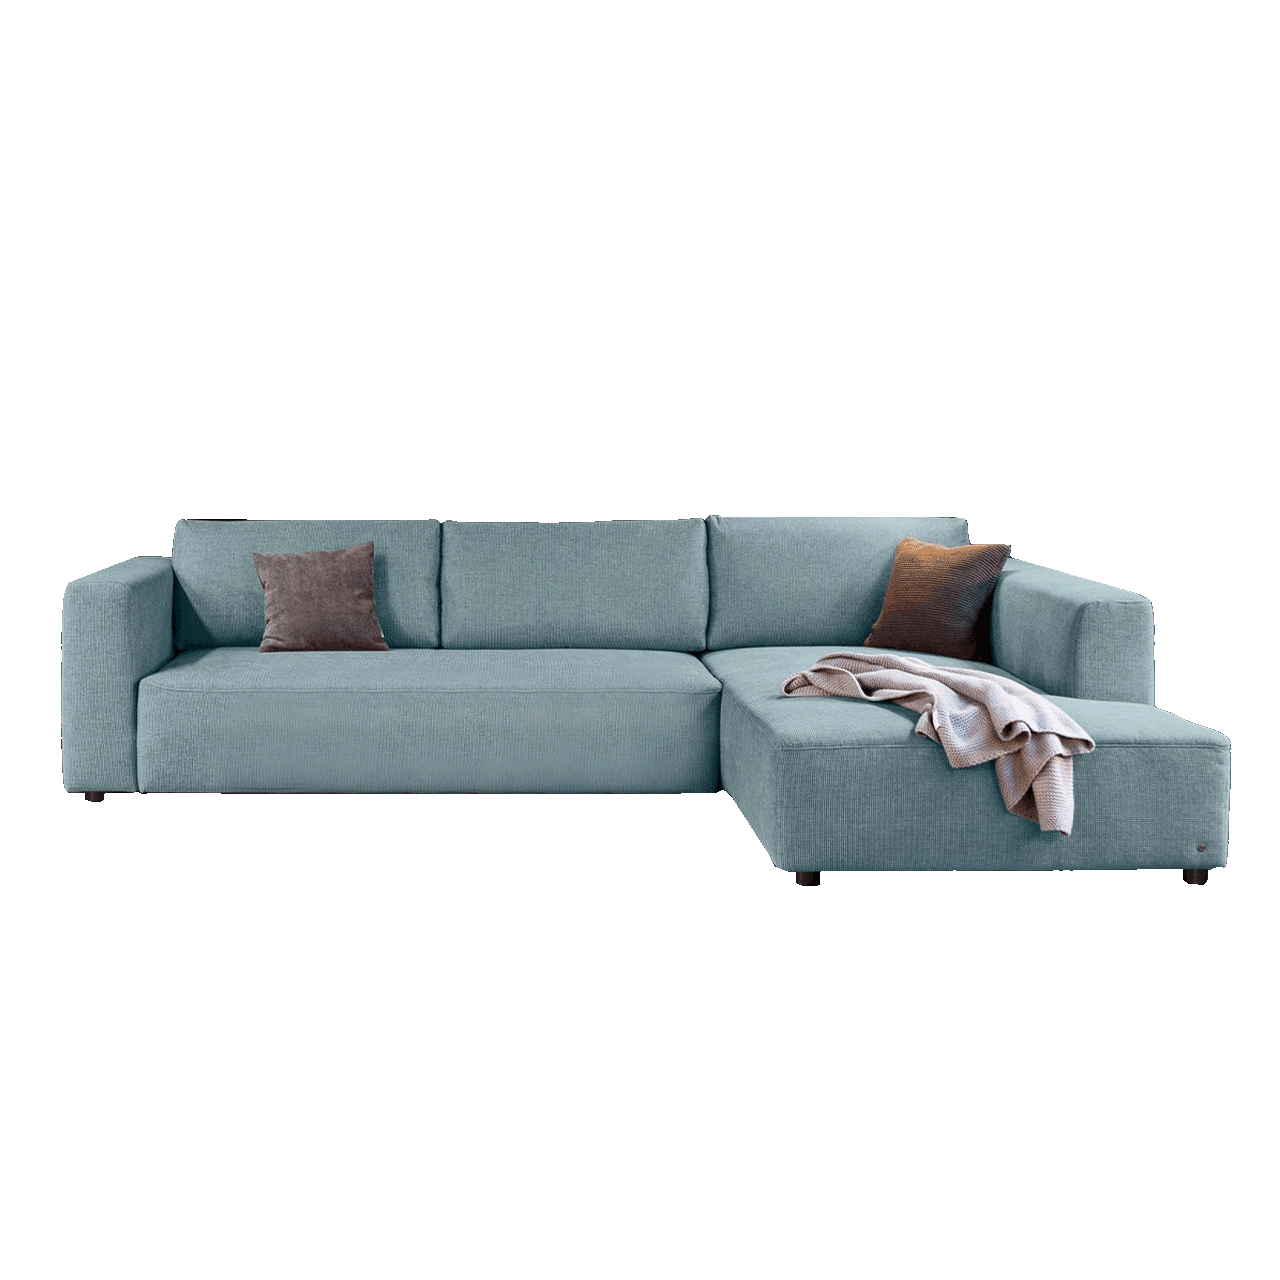 TOM TAILOR Sofa Heaven Style M